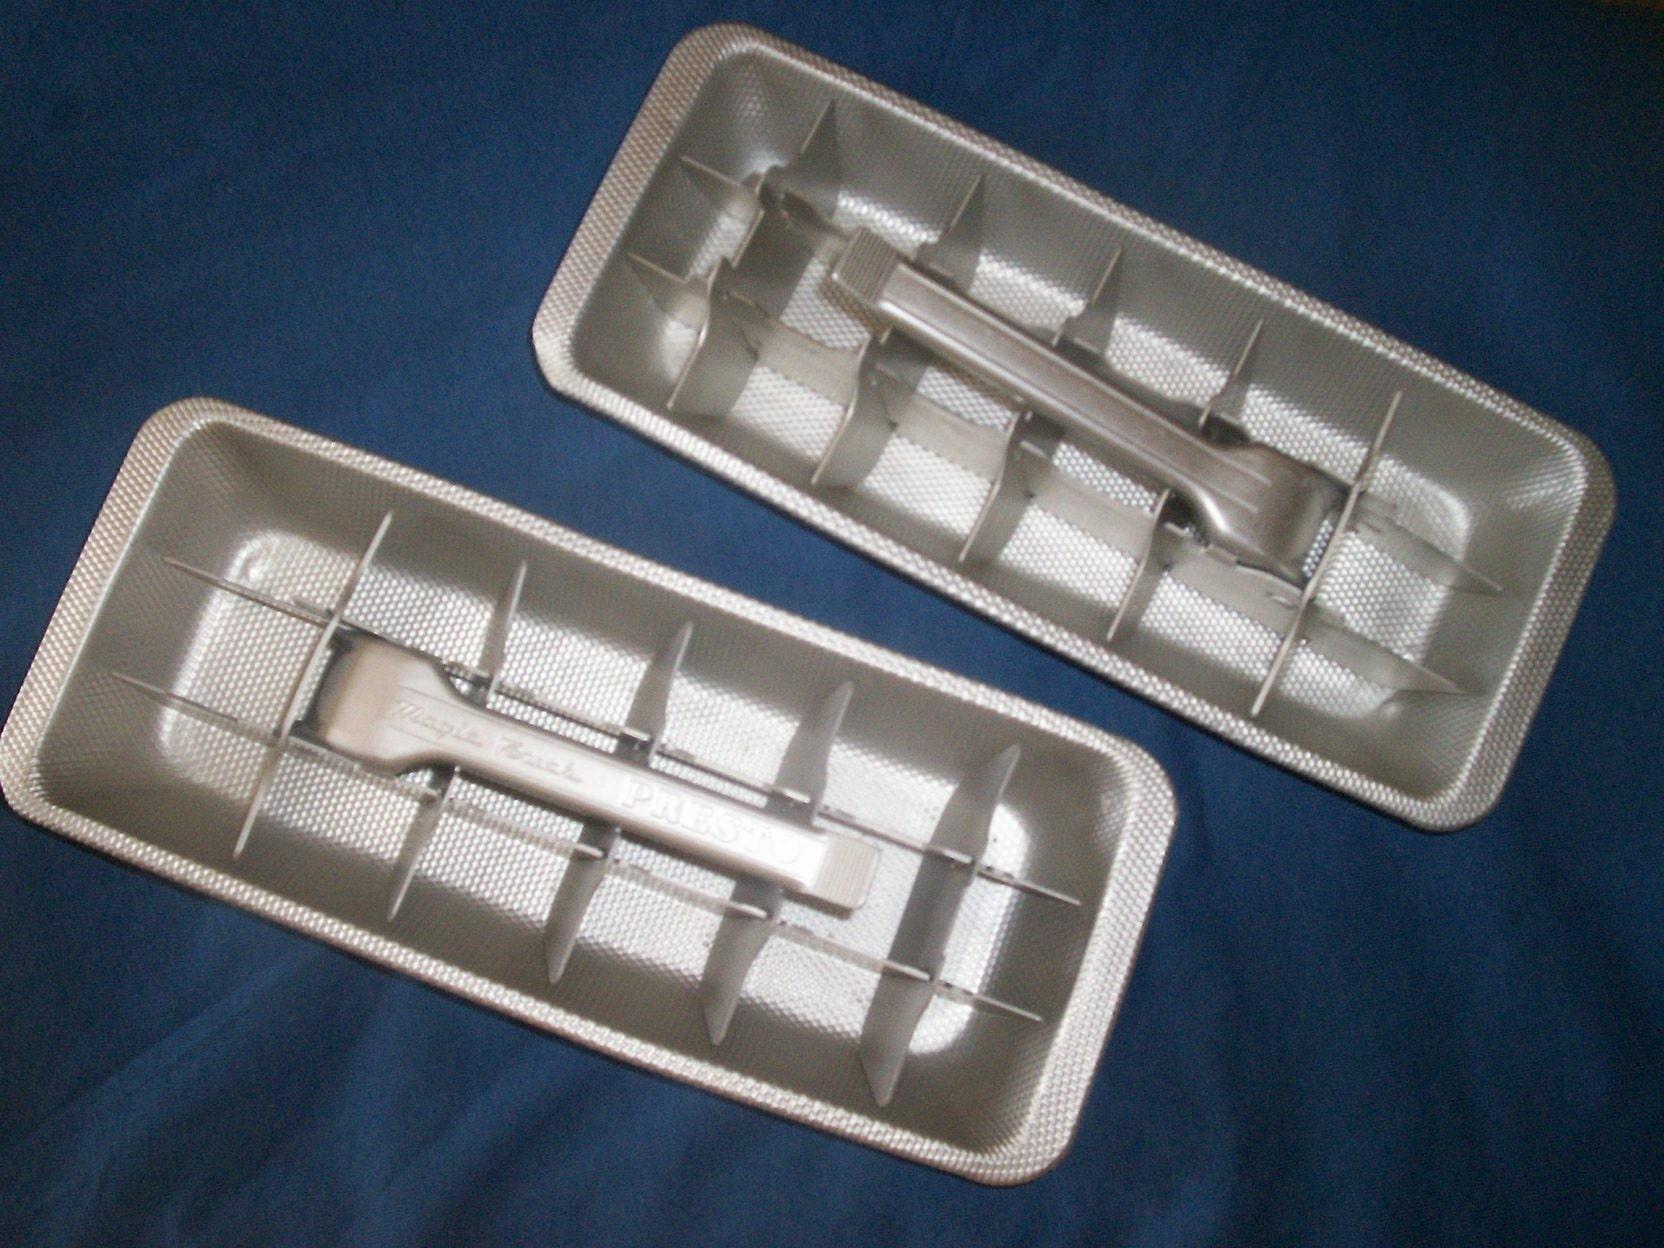 vintage metal ice cube trays by oldtreasures on etsy. Black Bedroom Furniture Sets. Home Design Ideas